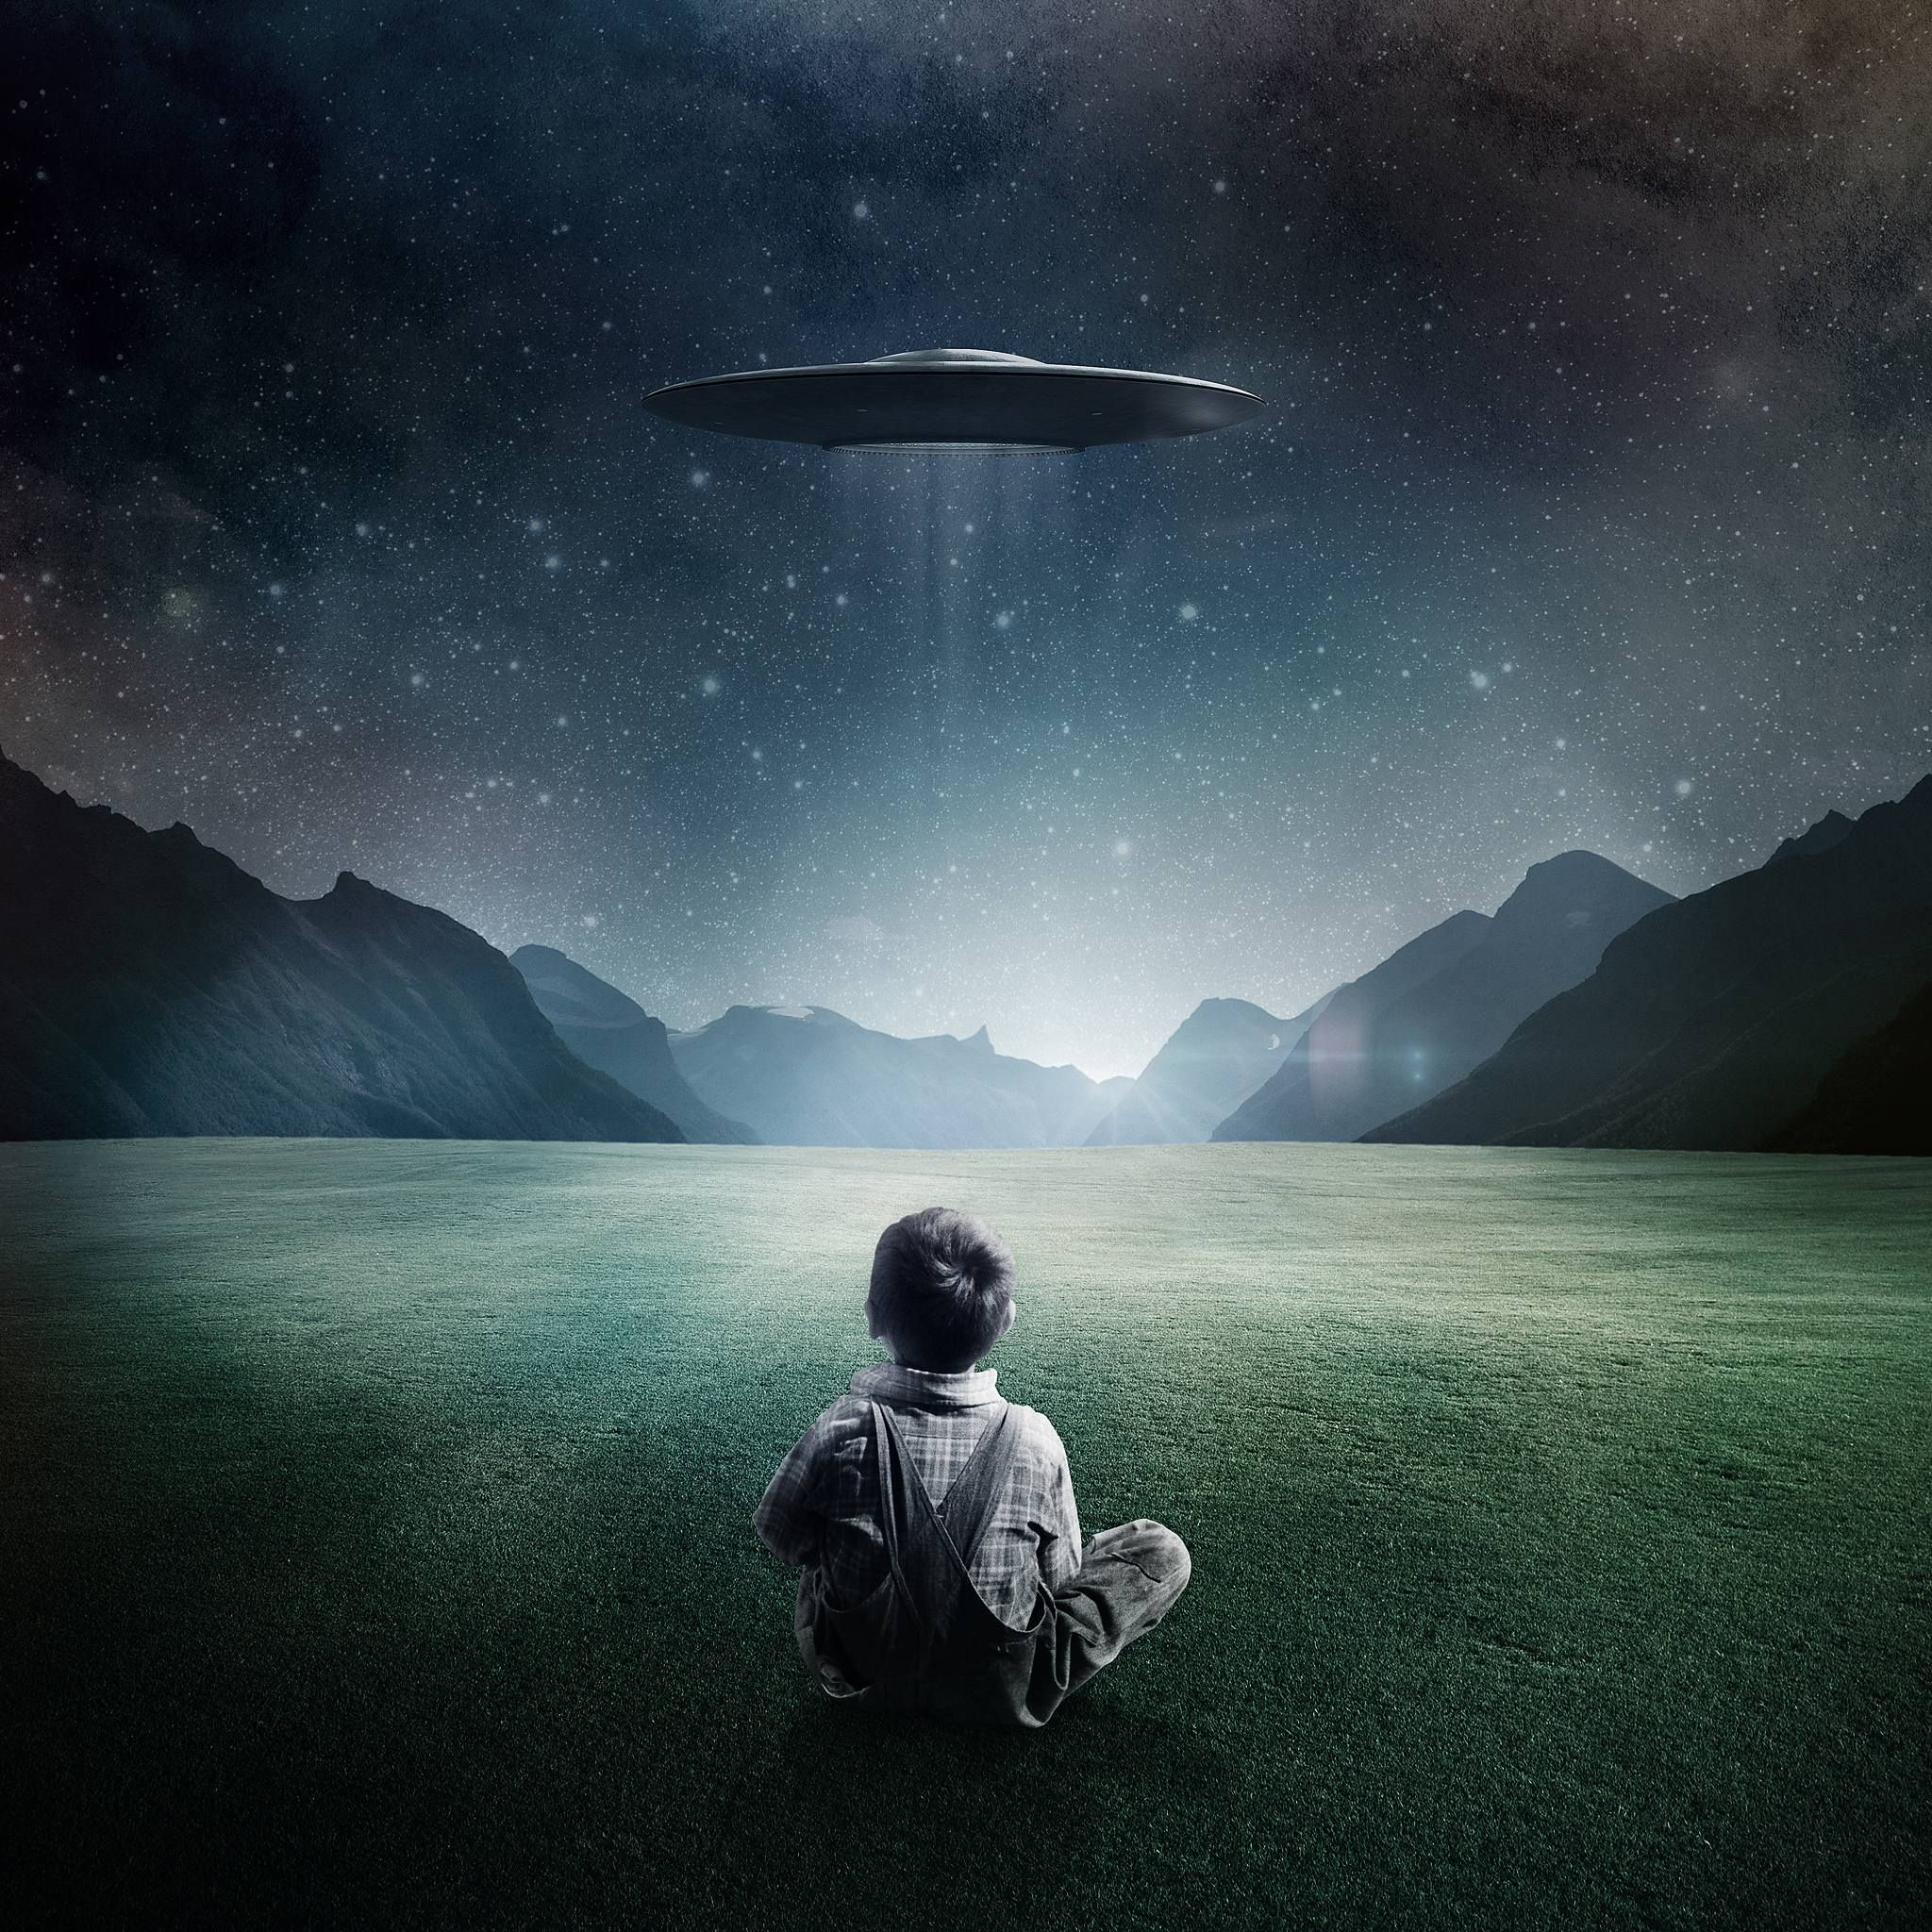 Alien UFO Wallpapers   Top Alien UFO Backgrounds 2048x2048